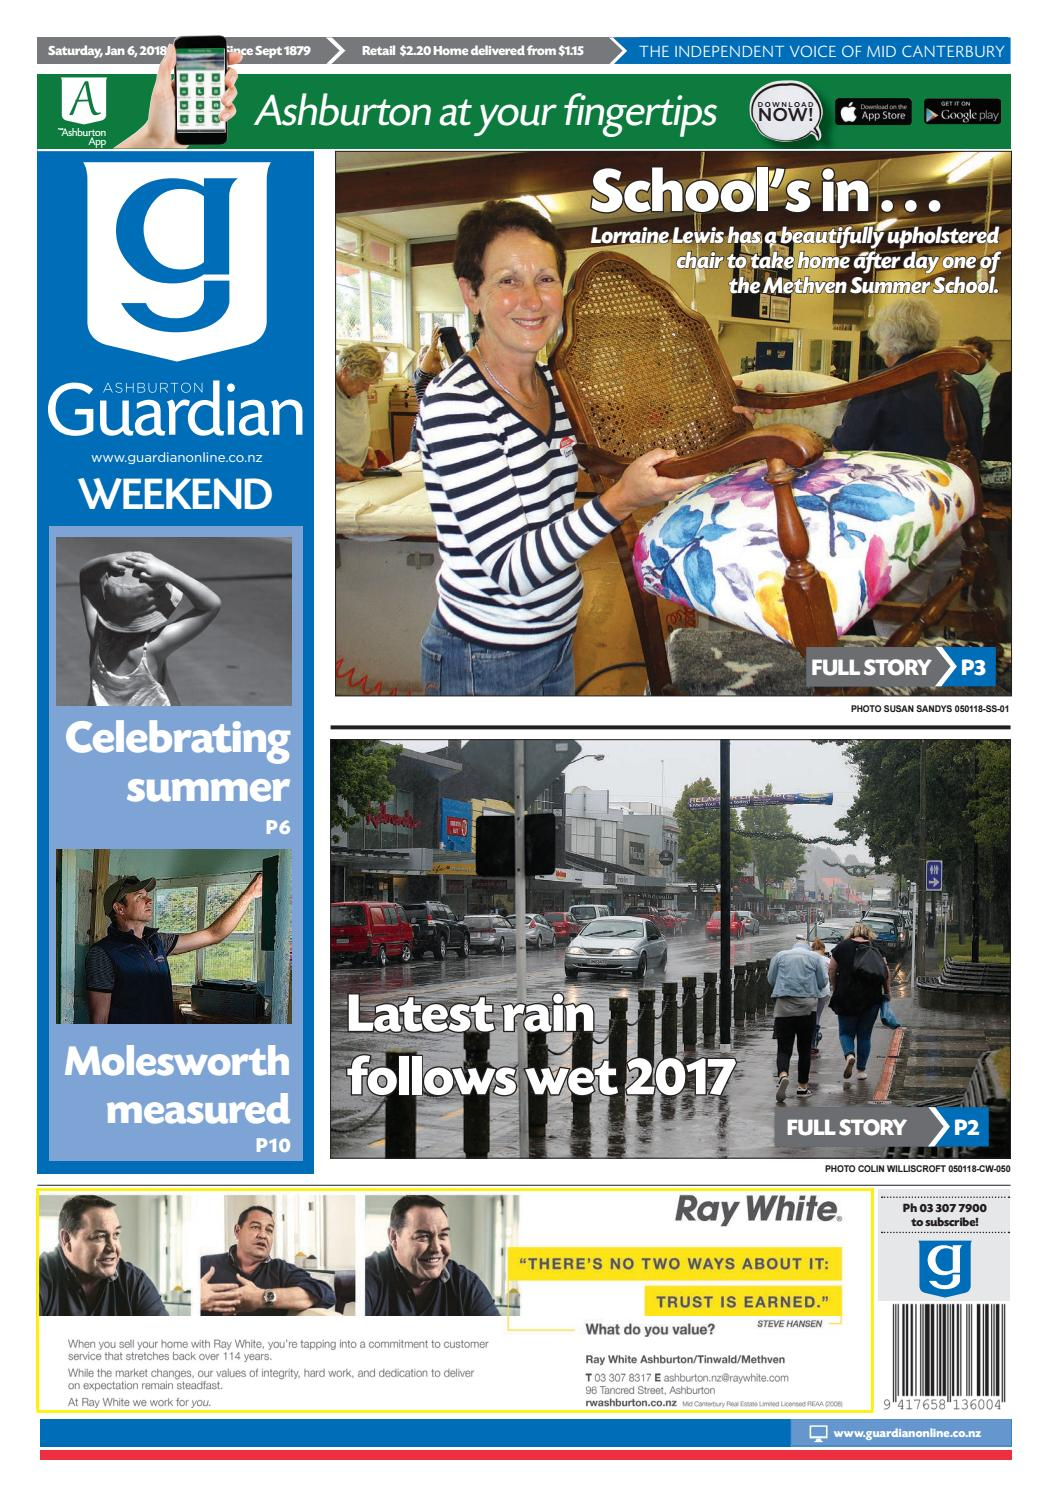 Ashburton Guardian Ag January2018 By Issuu 06 ONnwX80Pk